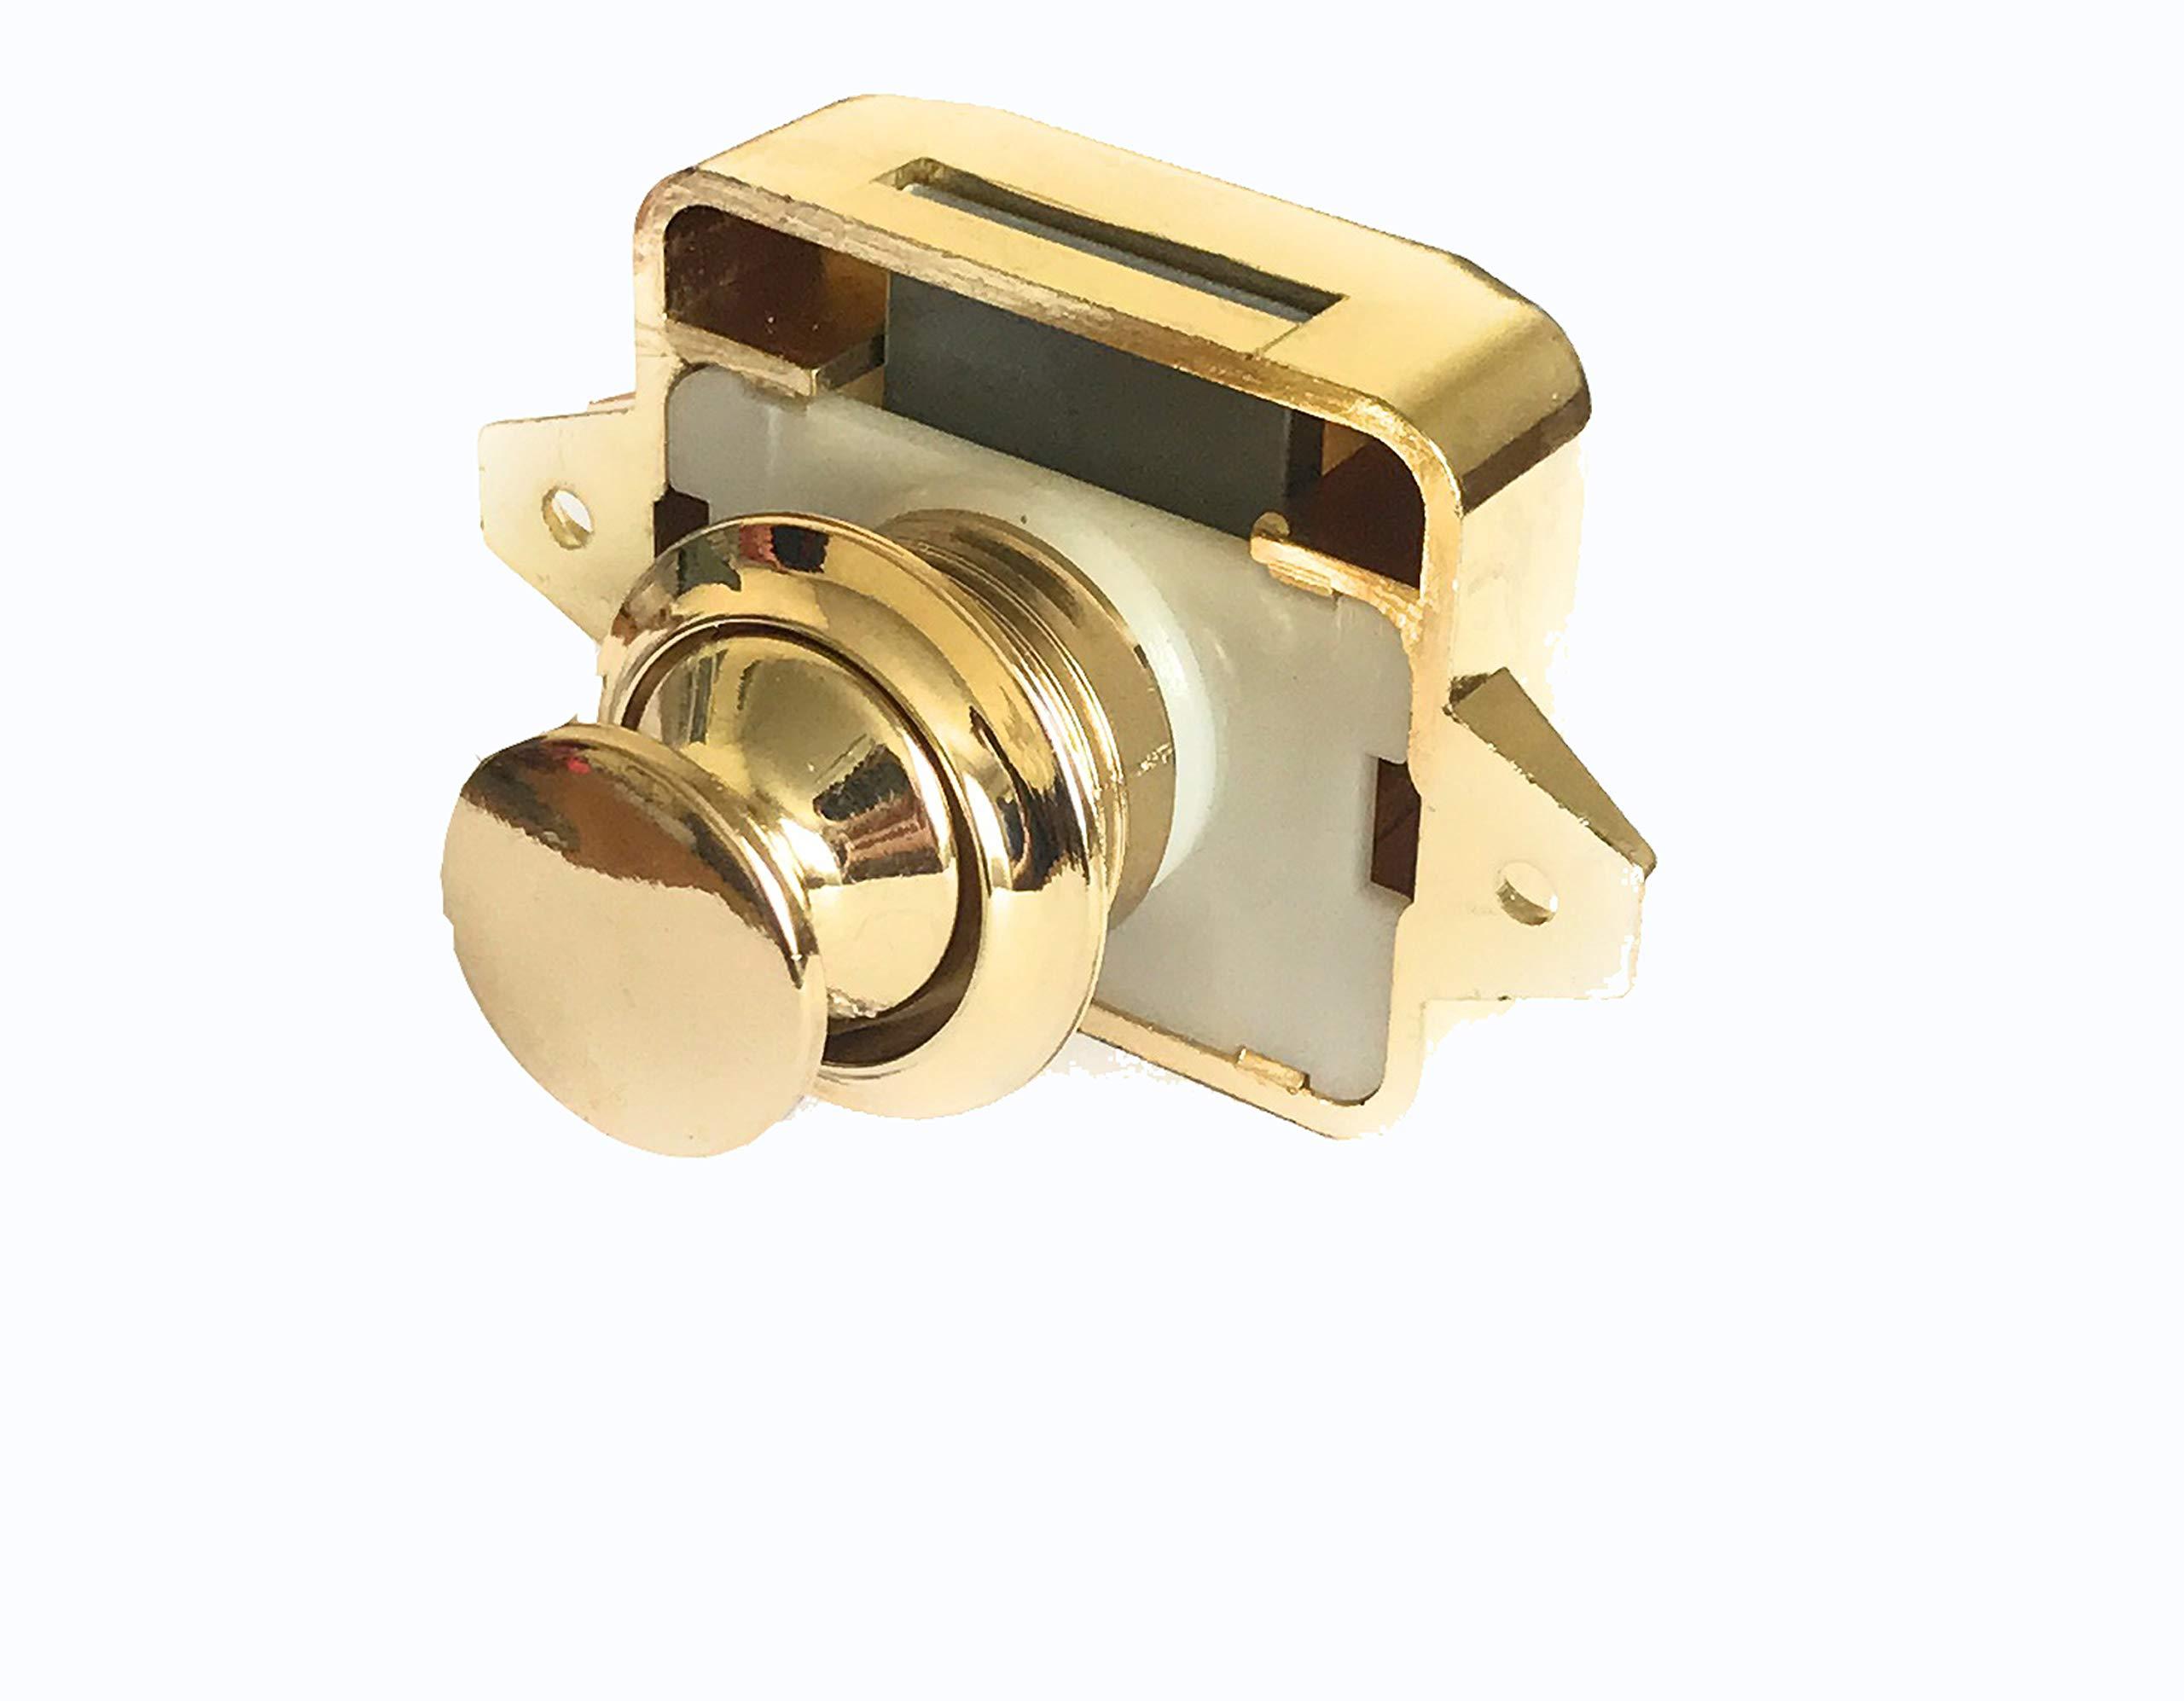 AMT Gold Key Less Push Button Cabinet Latch for Rv/Motor Home Cupboard Caravan Lock for Cupboard Push Latch Lock (5)